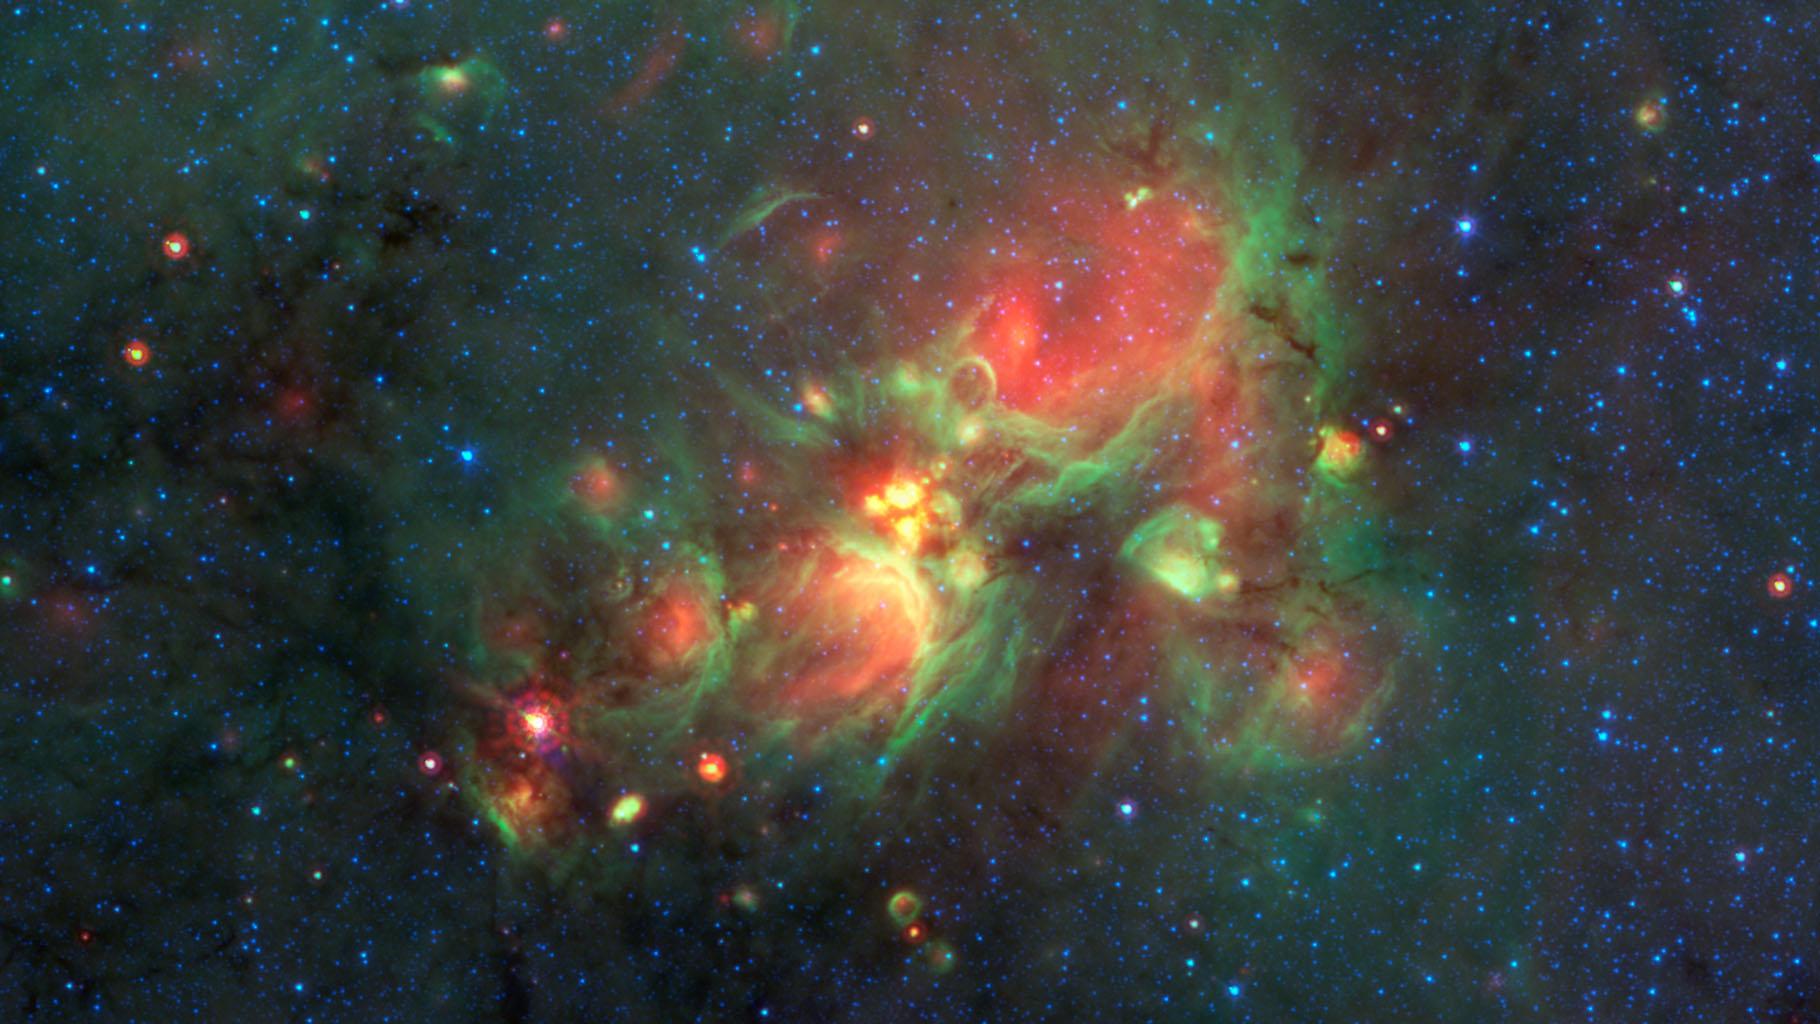 yellow star astronomy - photo #20